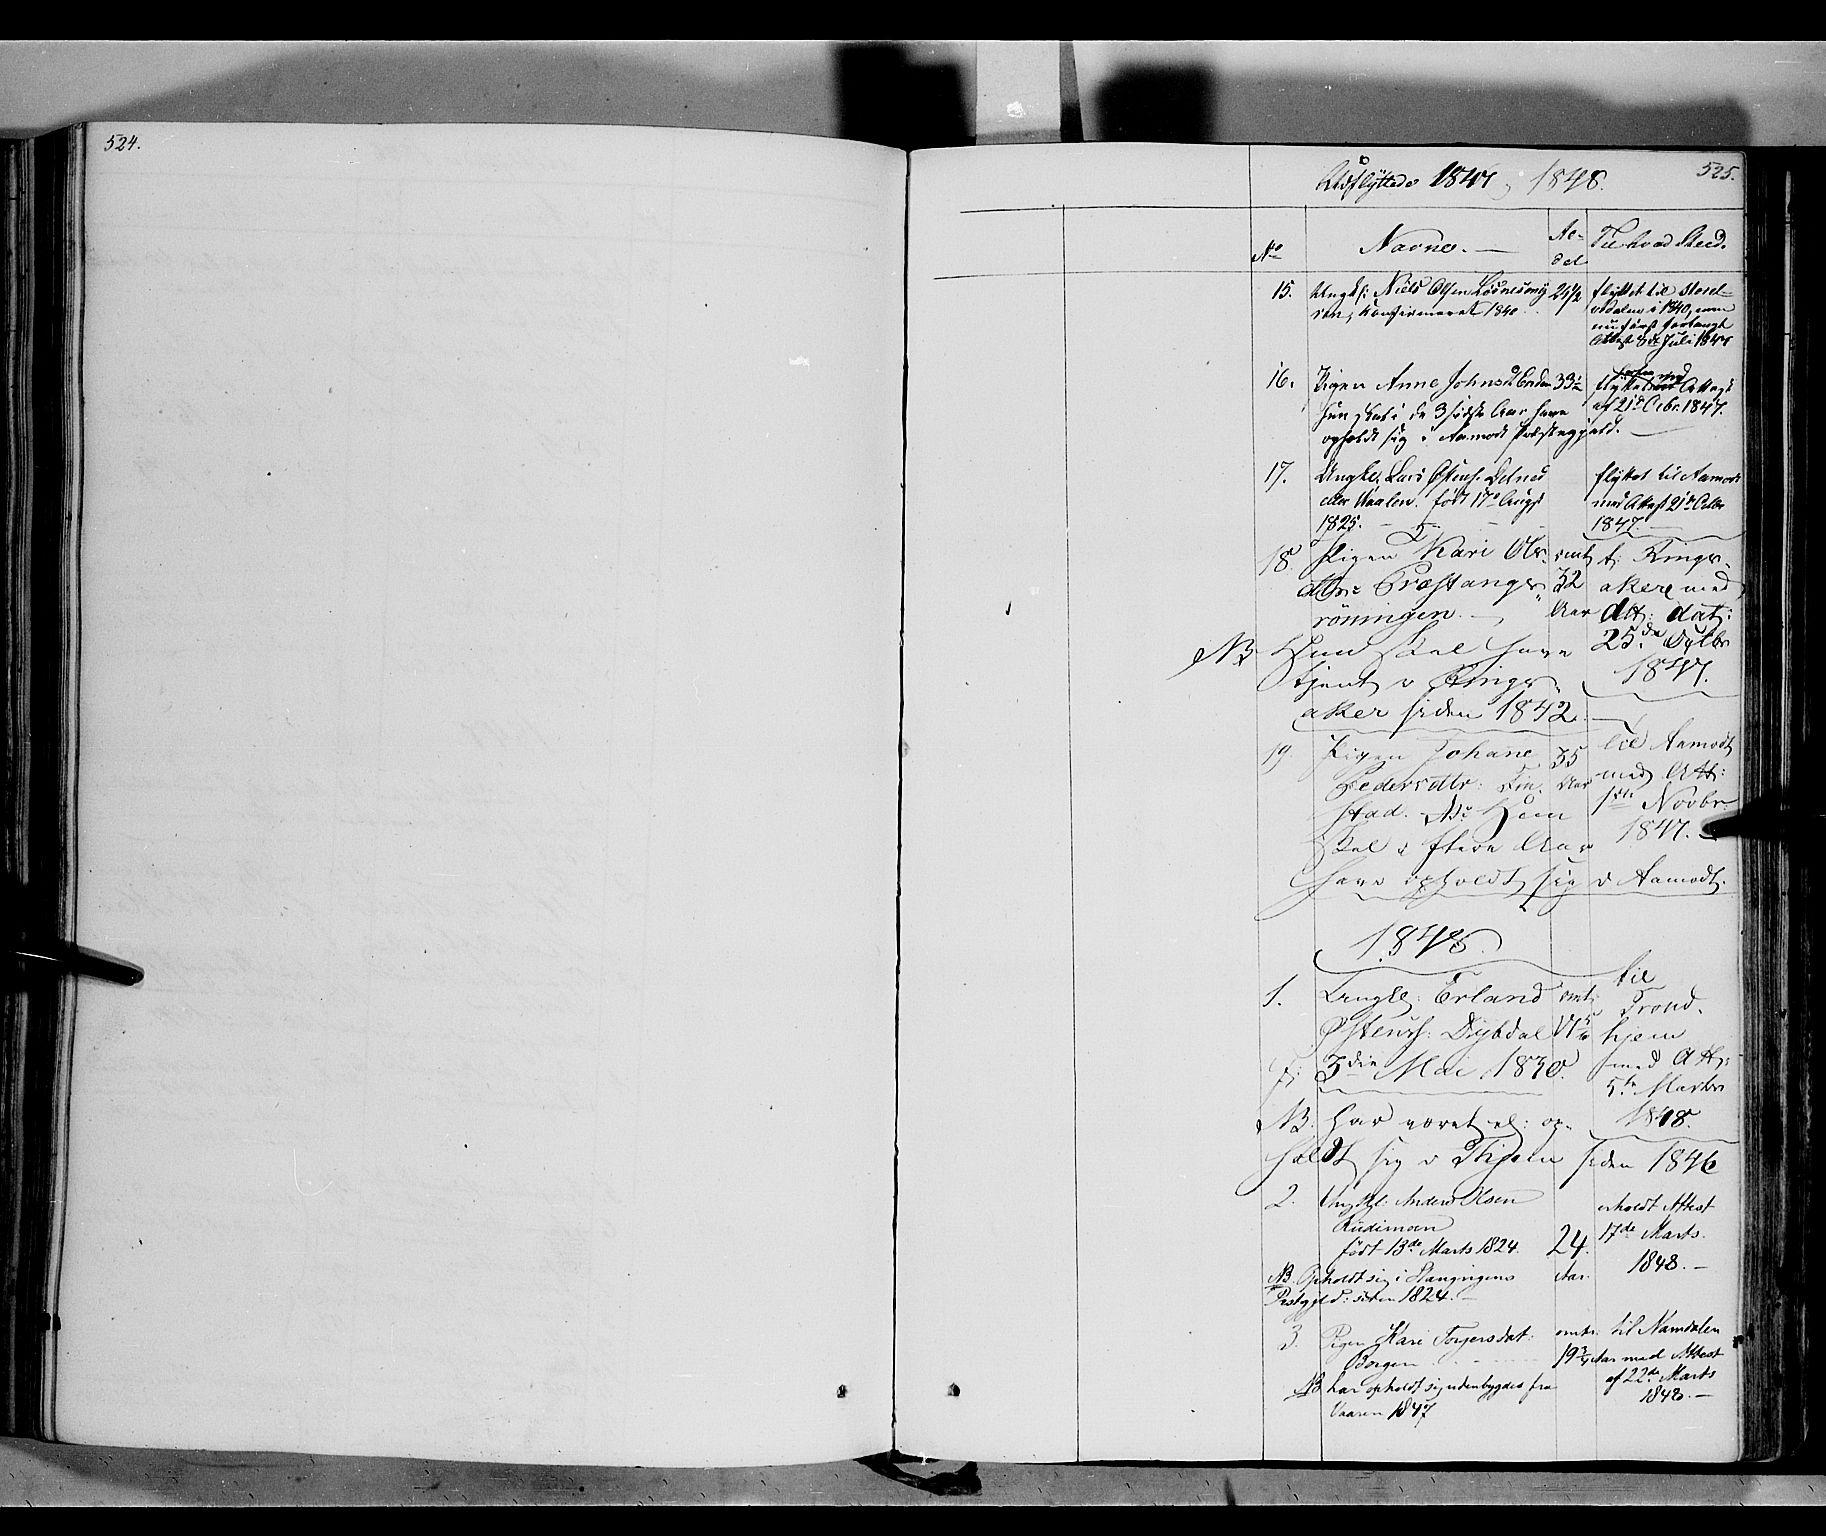 SAH, Ringebu prestekontor, Ministerialbok nr. 5, 1839-1848, s. 524-525